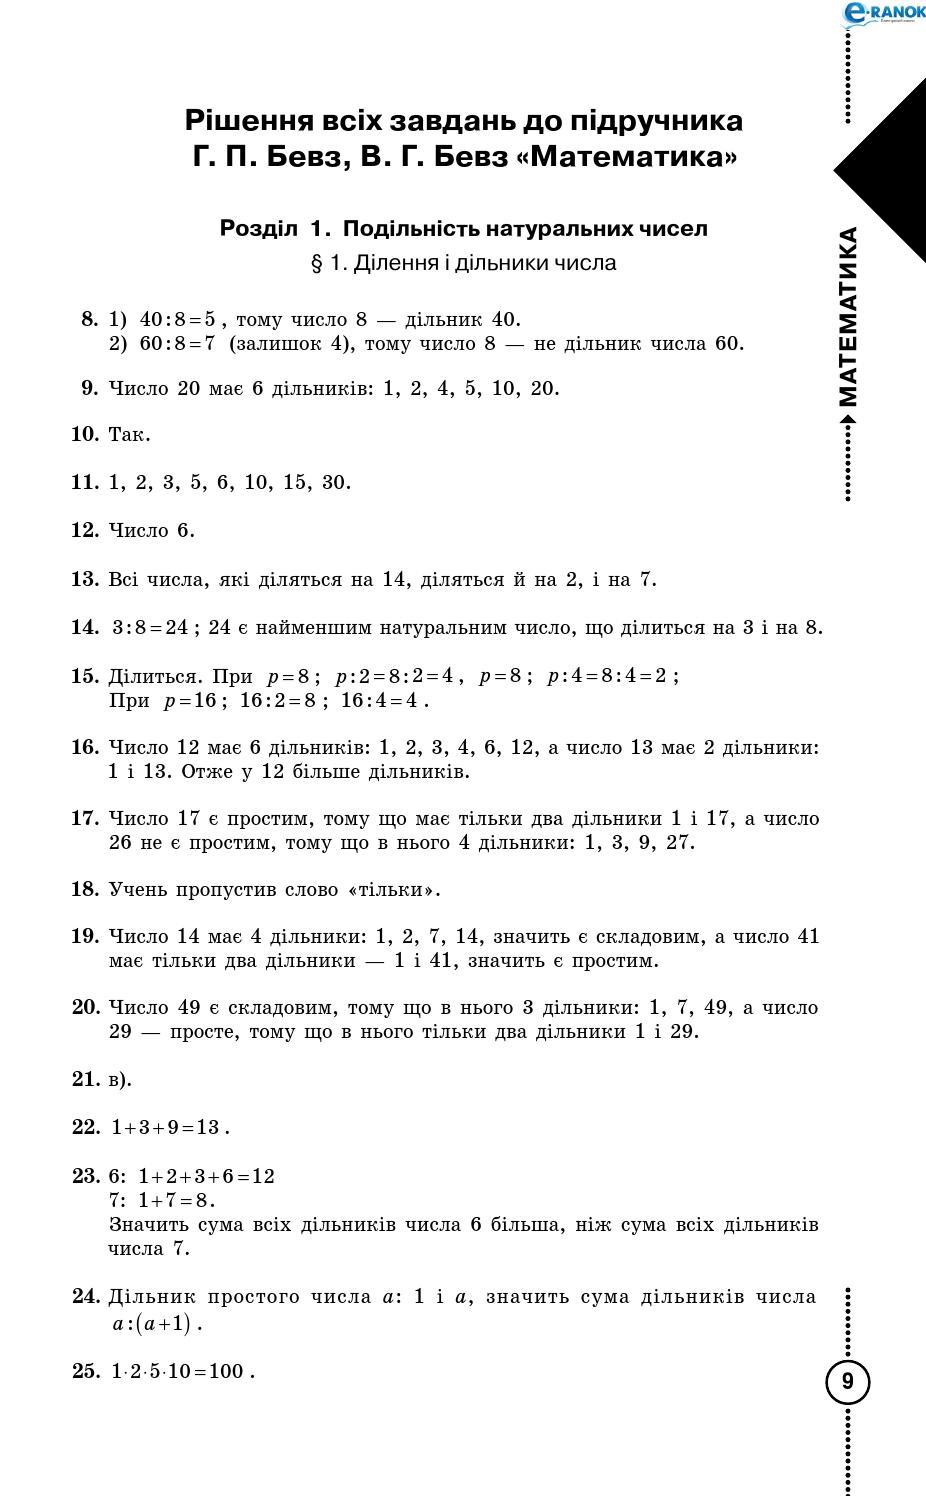 гдз для 10 класу математика г.п.бевз в.г бевз